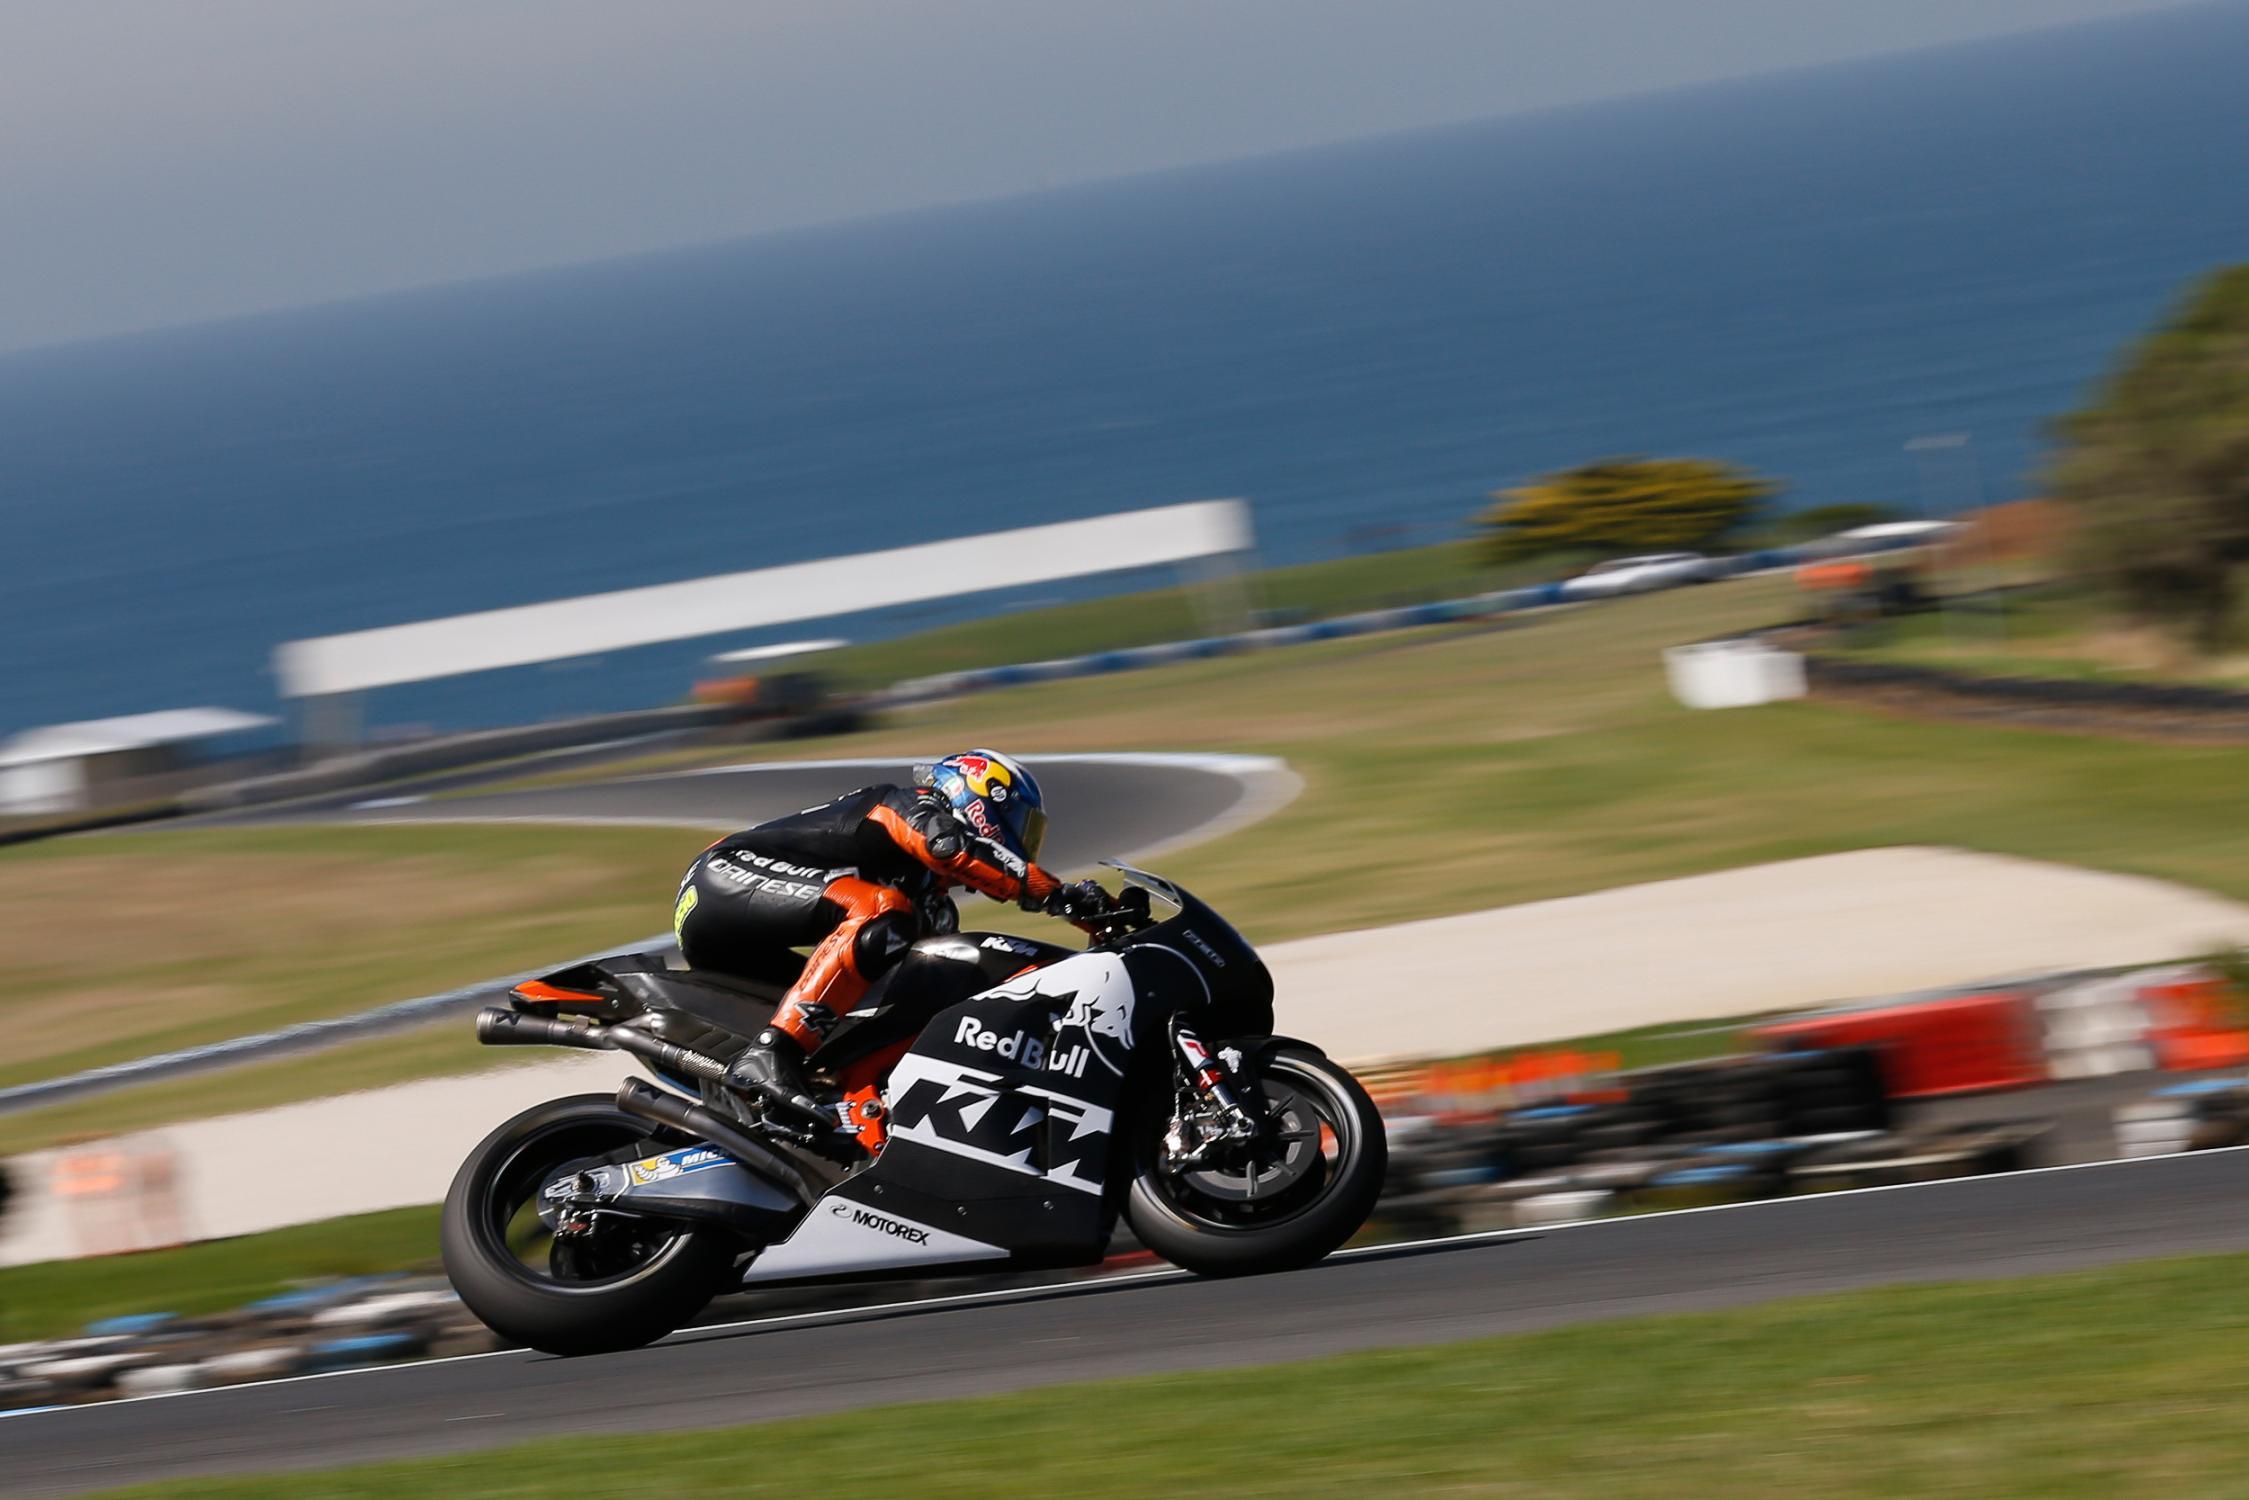 [MotoGP] Test Phillip Island 44-pol-espargaro-esp_tp23496.gallery_full_top_fullscreen